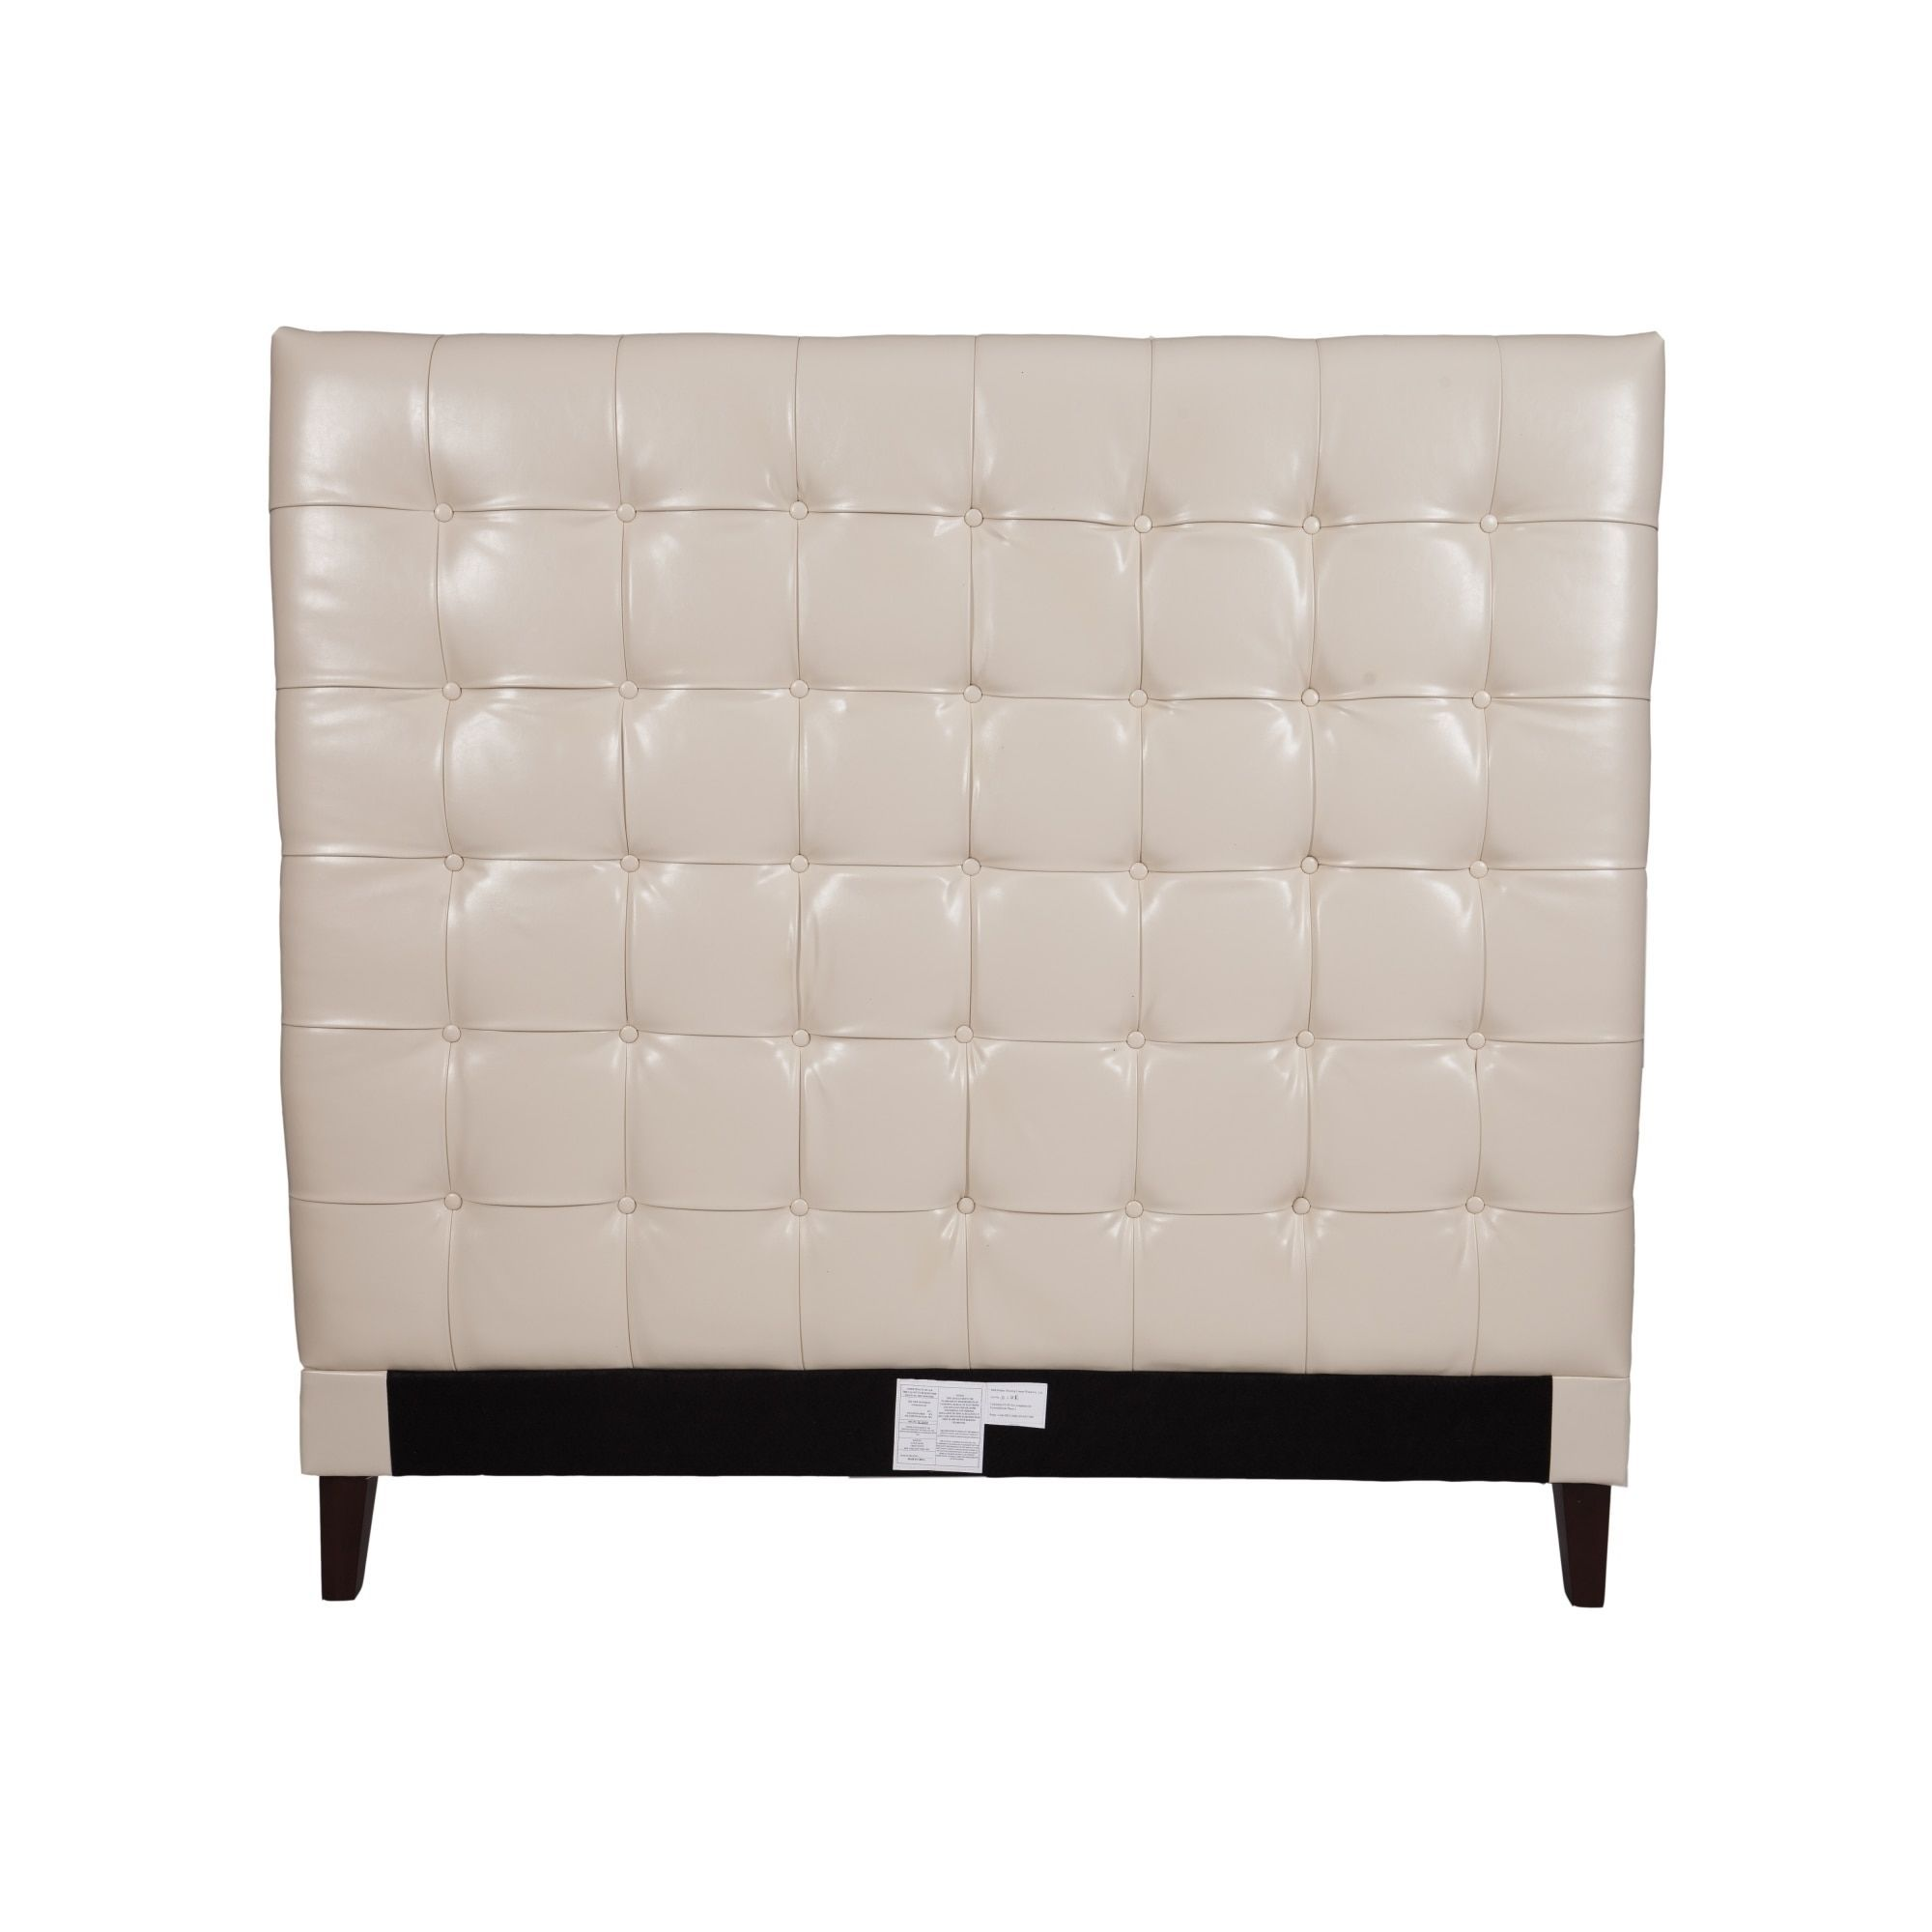 bedroom romantic wall classic and white headboard rug granite cotton floor gypsum beds grey black cream canopy coverlet bedspread